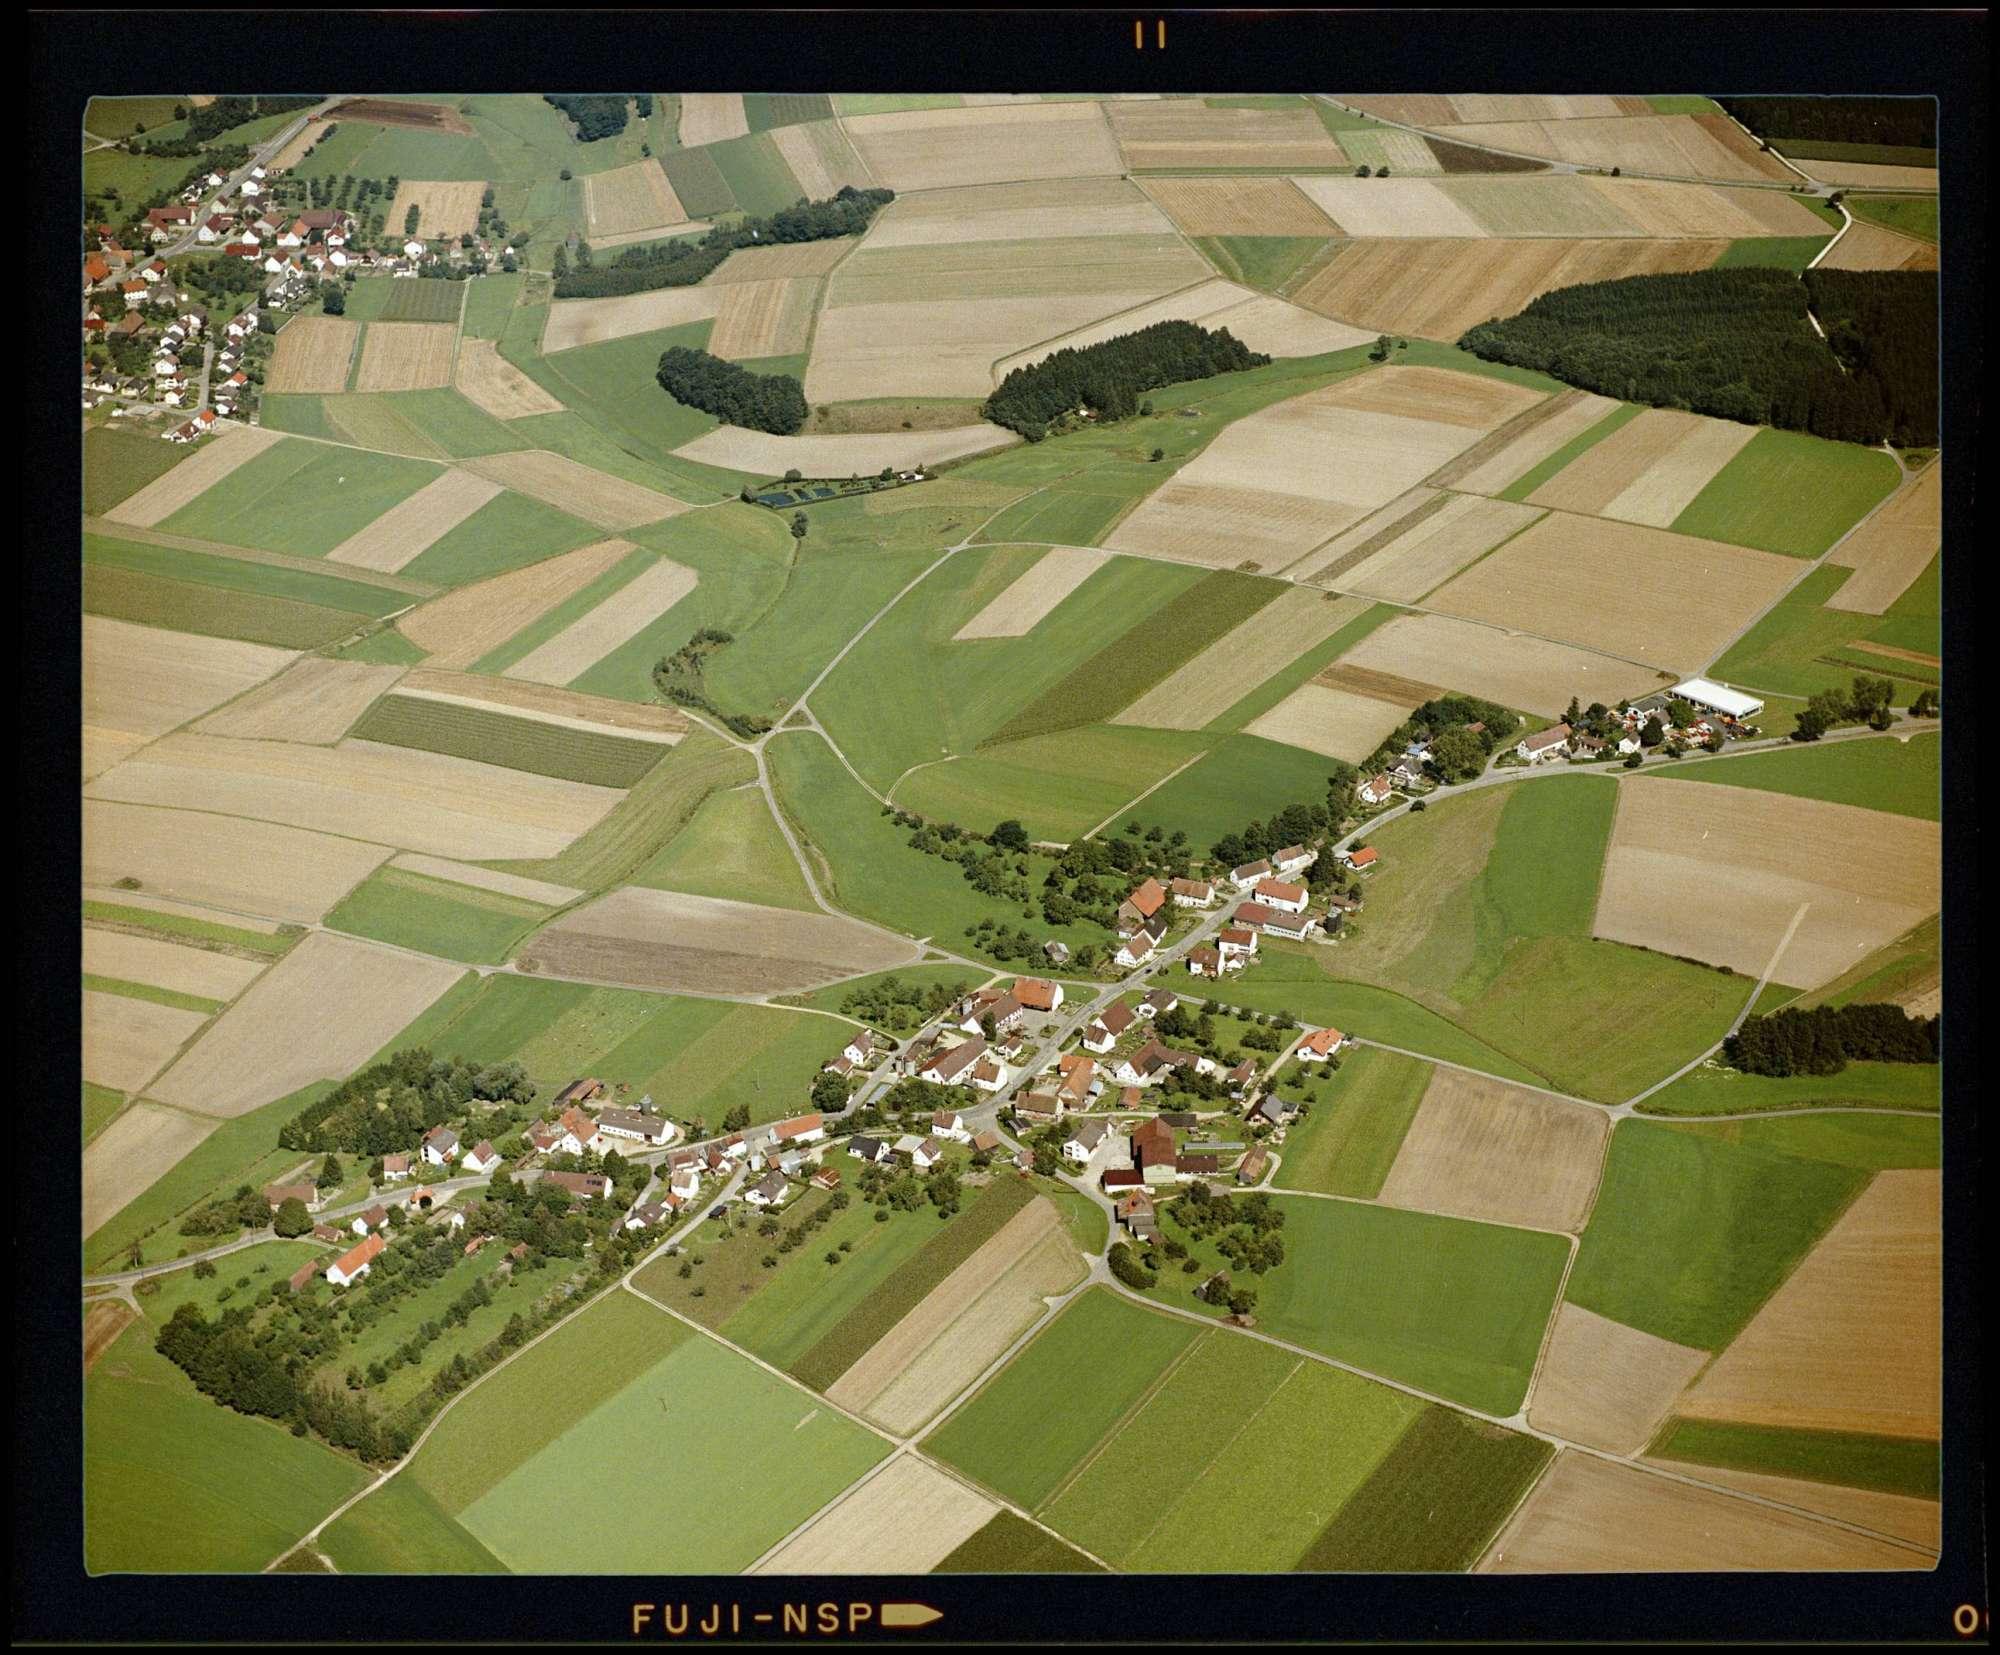 Ammerstetten, Luftbild, Bild 1